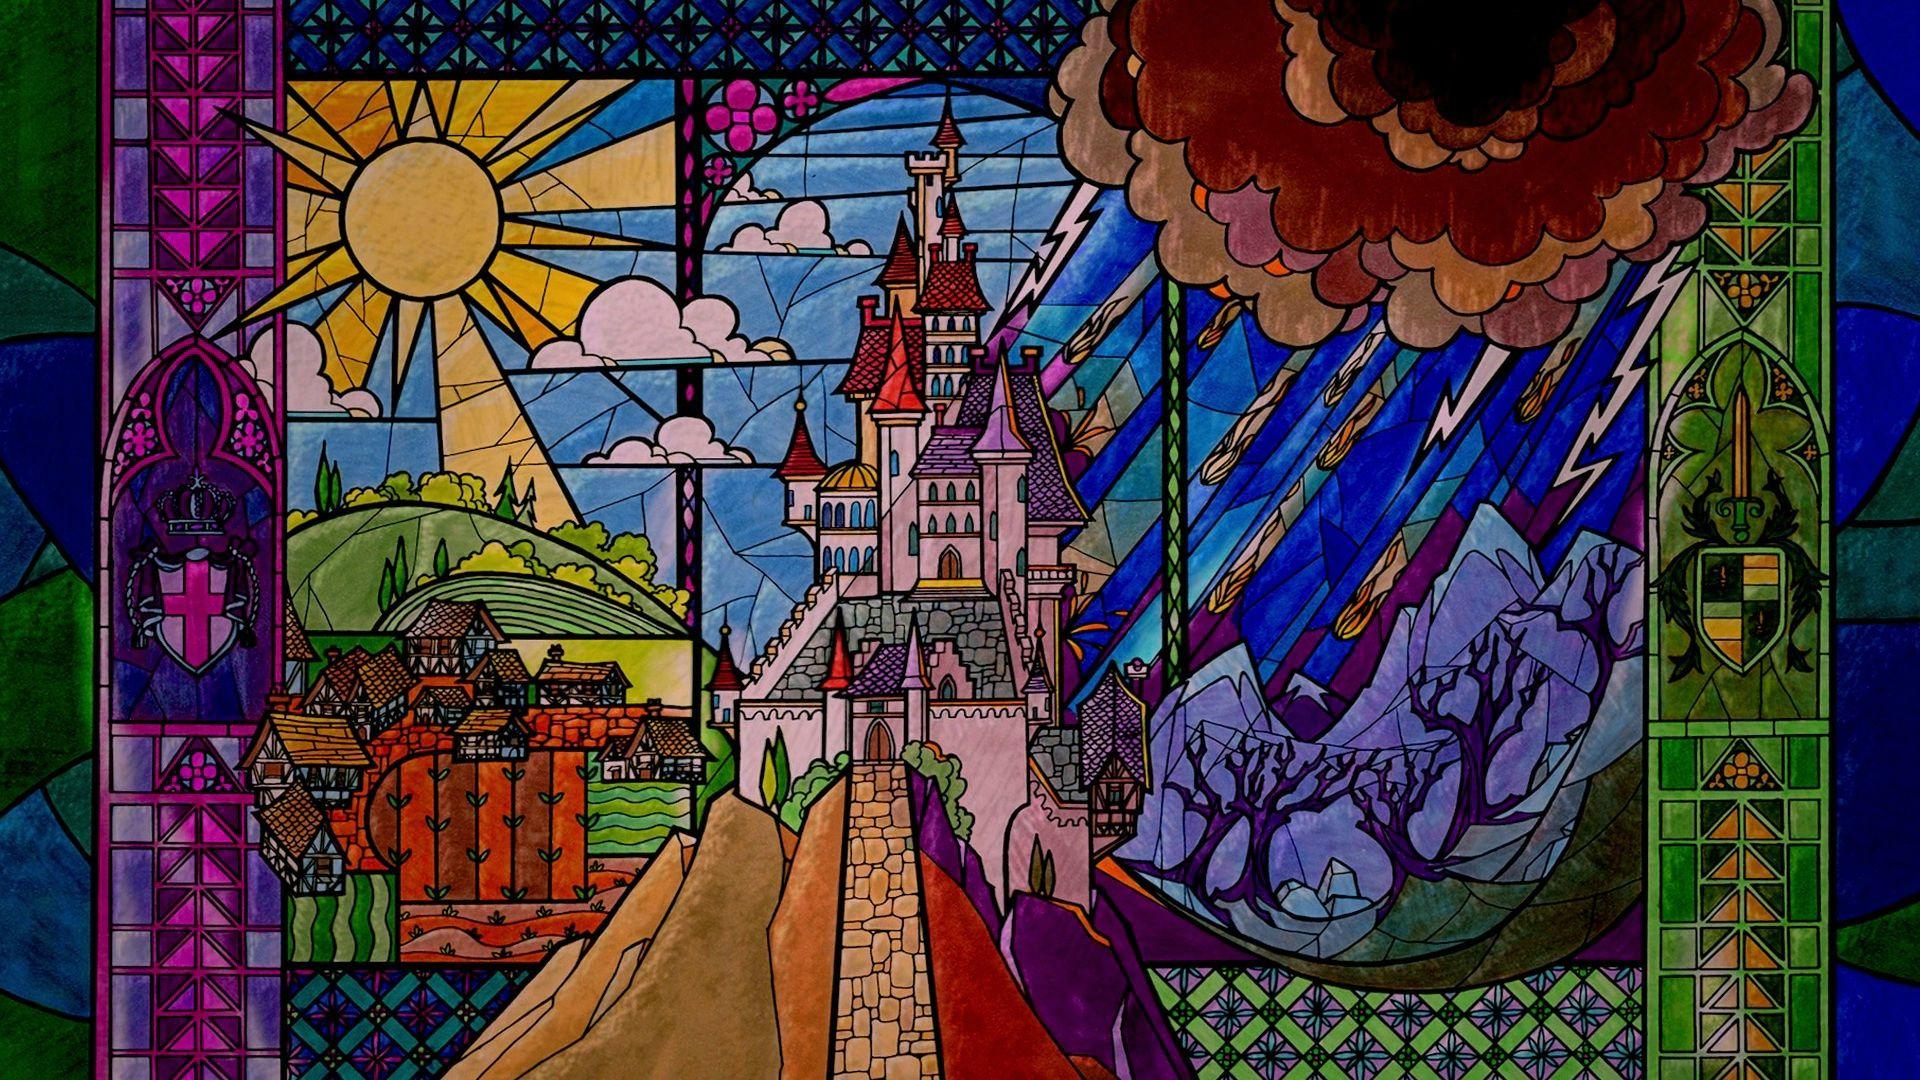 Витражи сказка замок